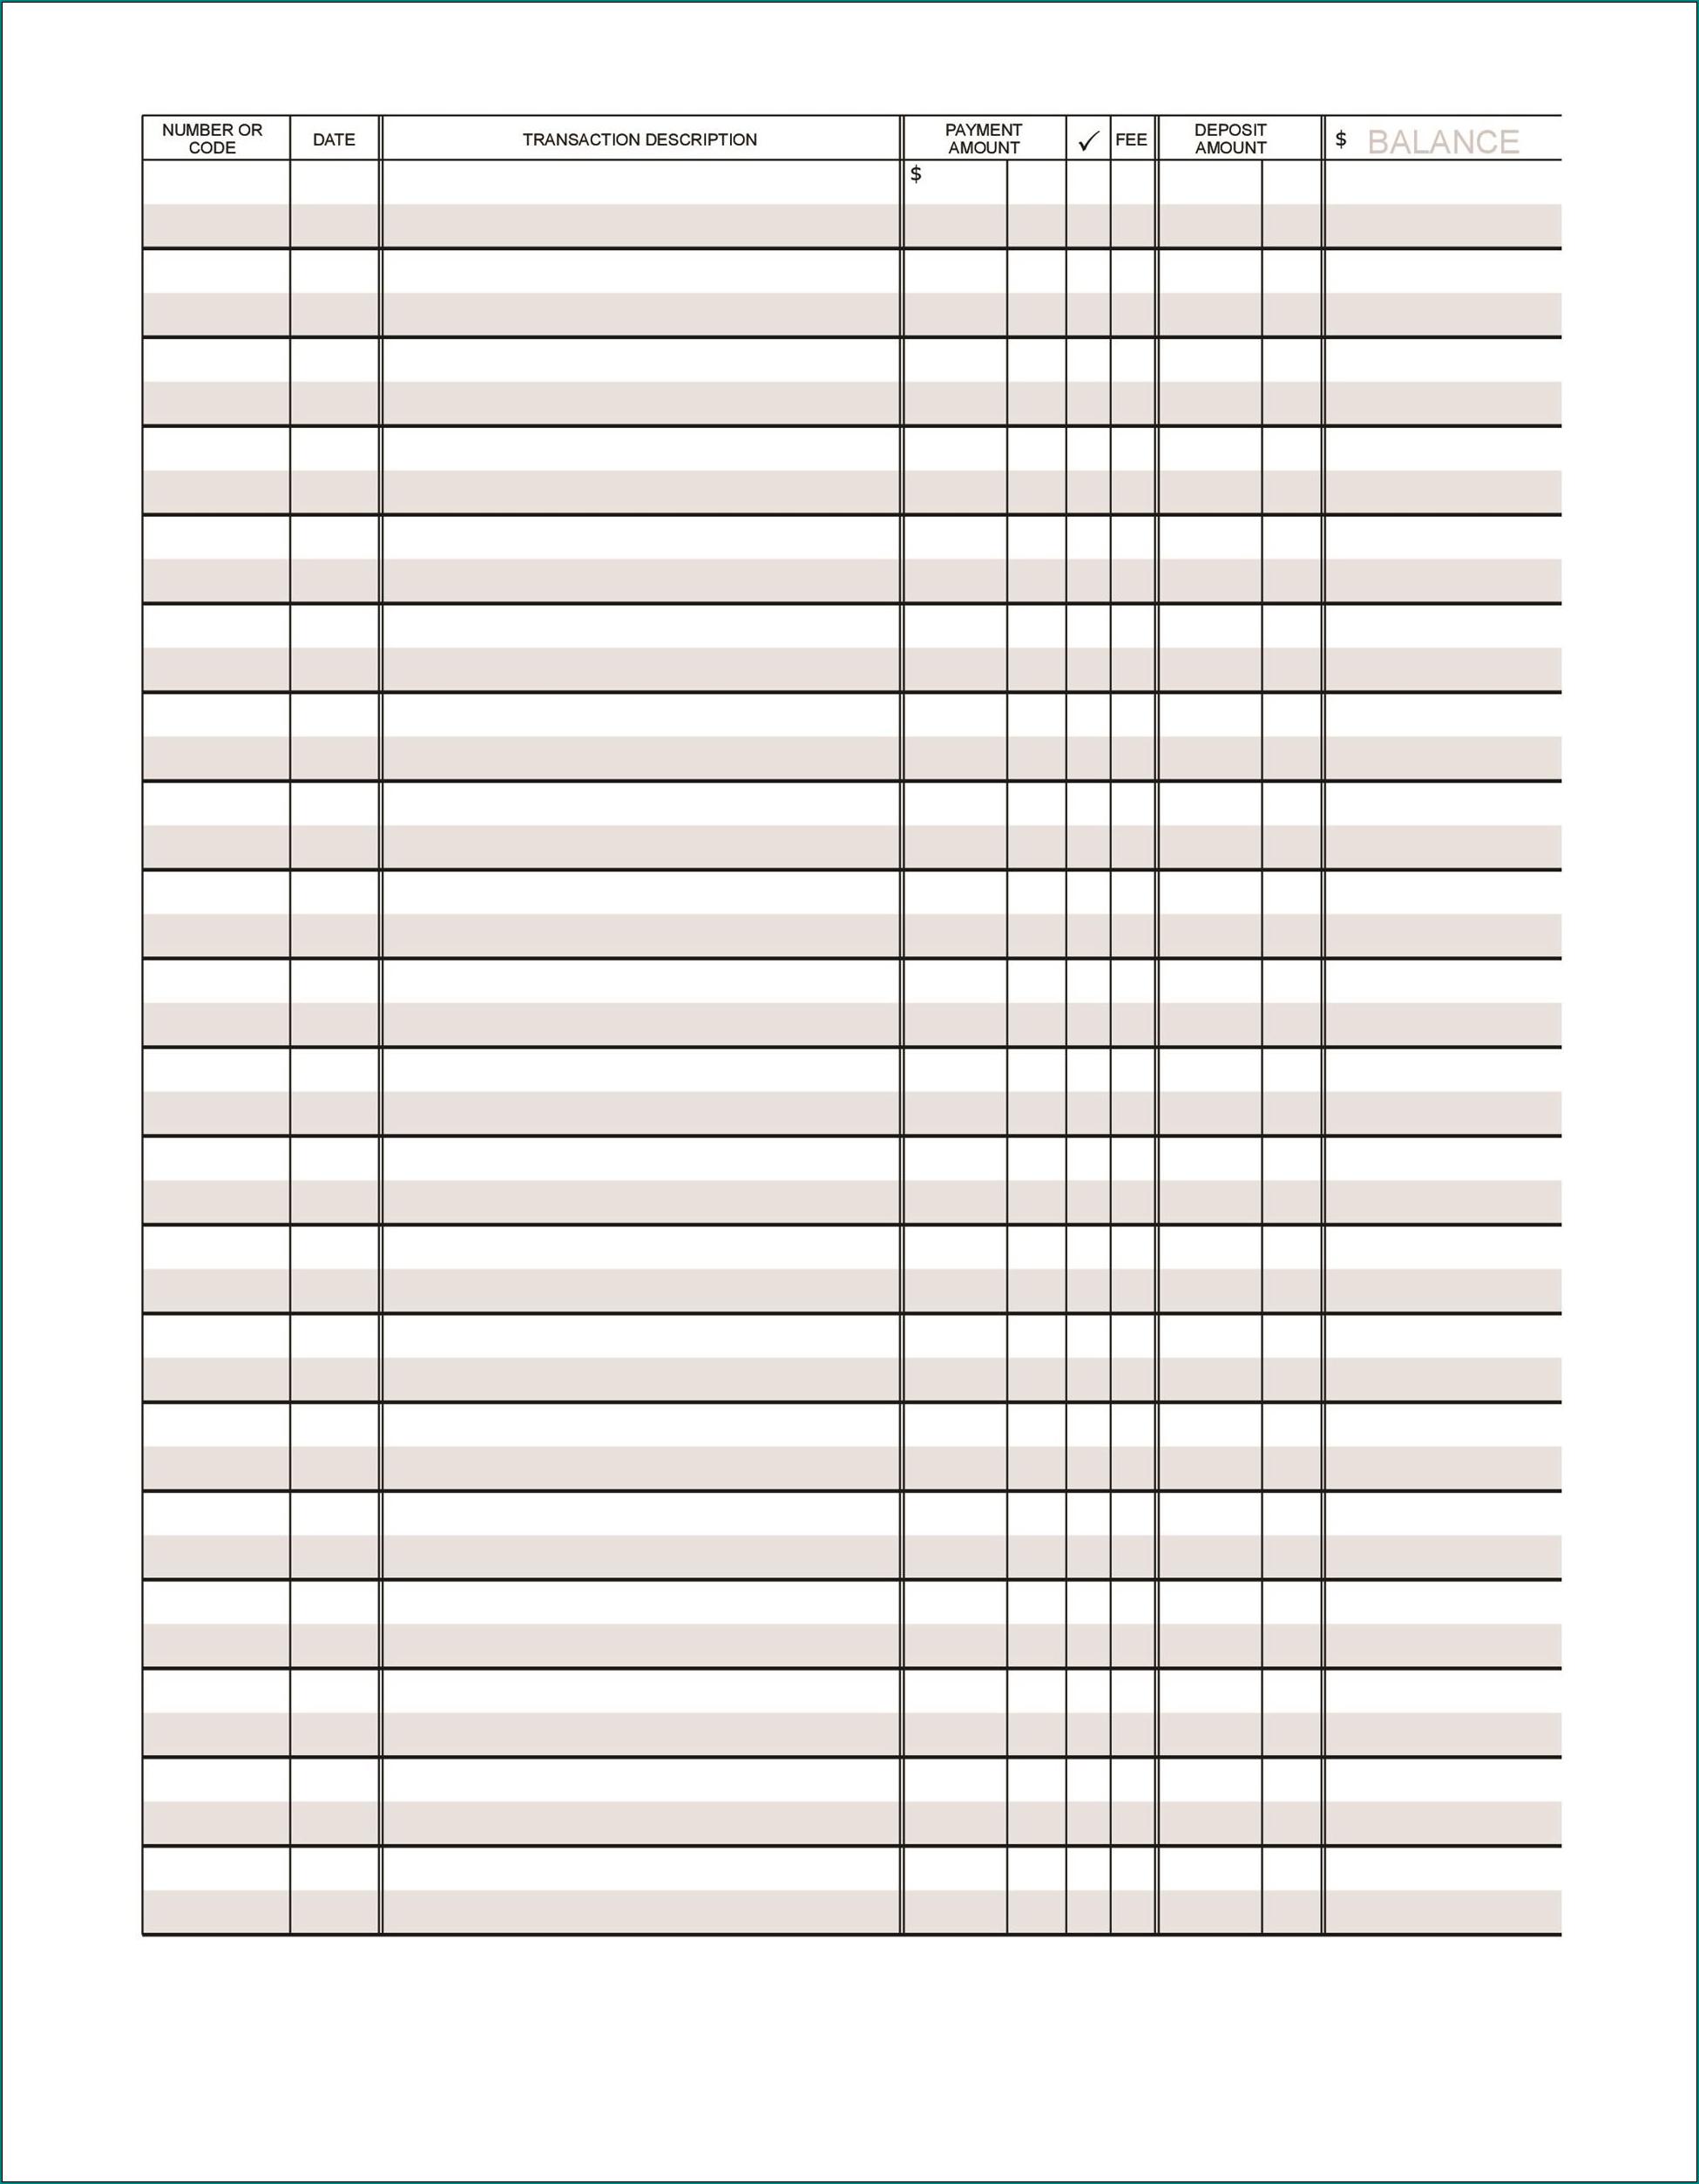 Sample of Checkbook Register Template